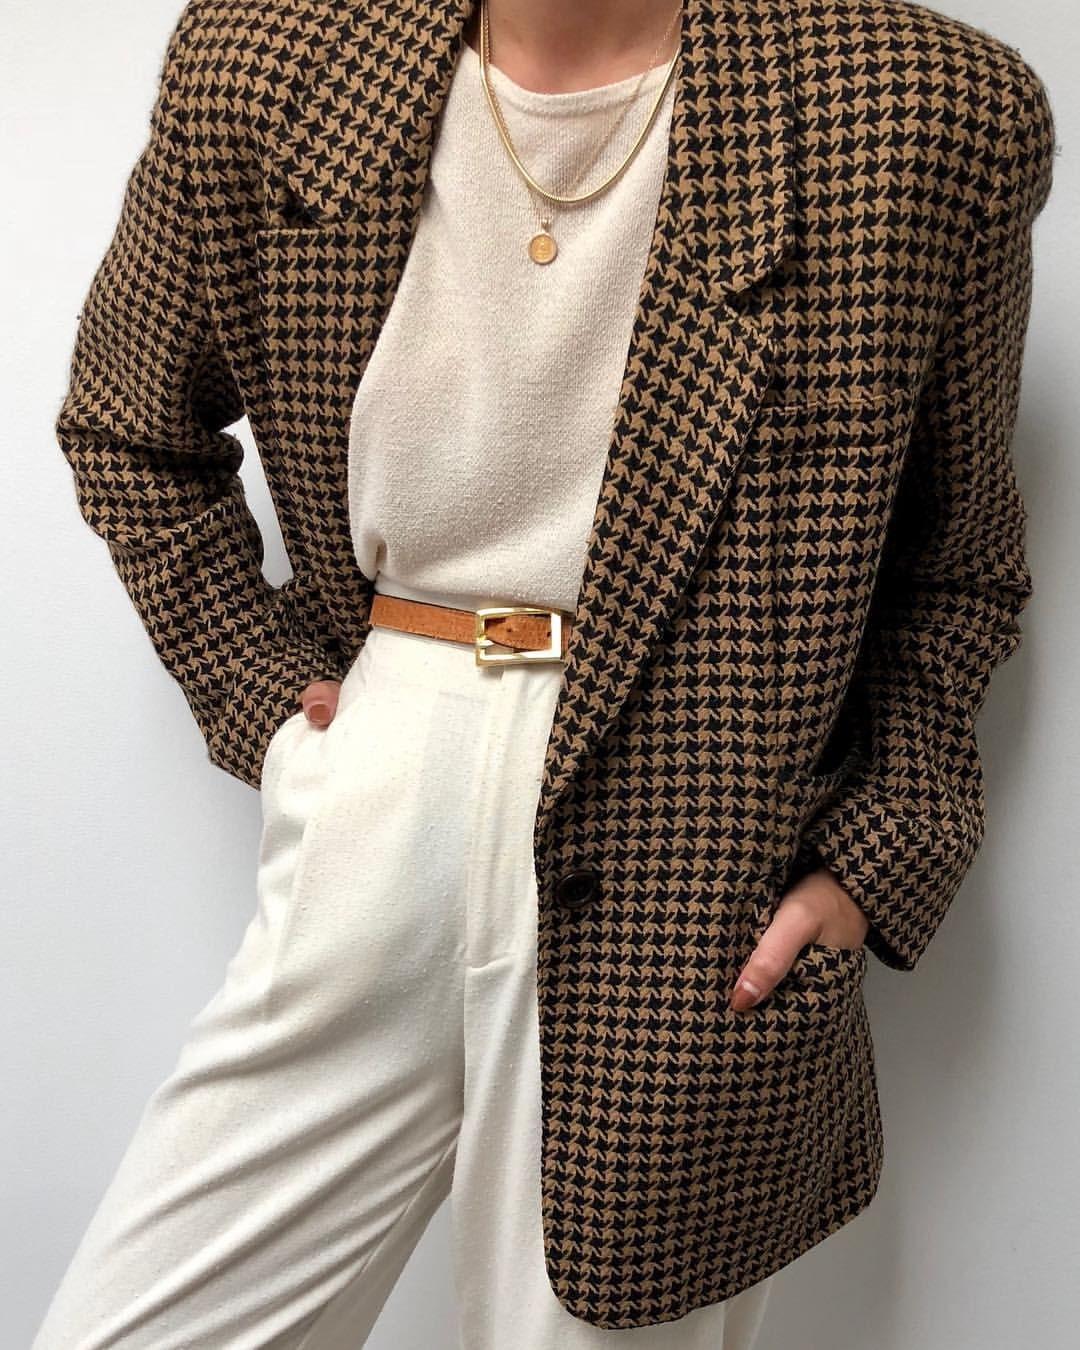 Fashion Fashion Outfits Fashion Ideas Checked Outfit Checked Blazer Checked Trousers Checked Coat Cream Vintage Blazer Fashion Fashion Inspo